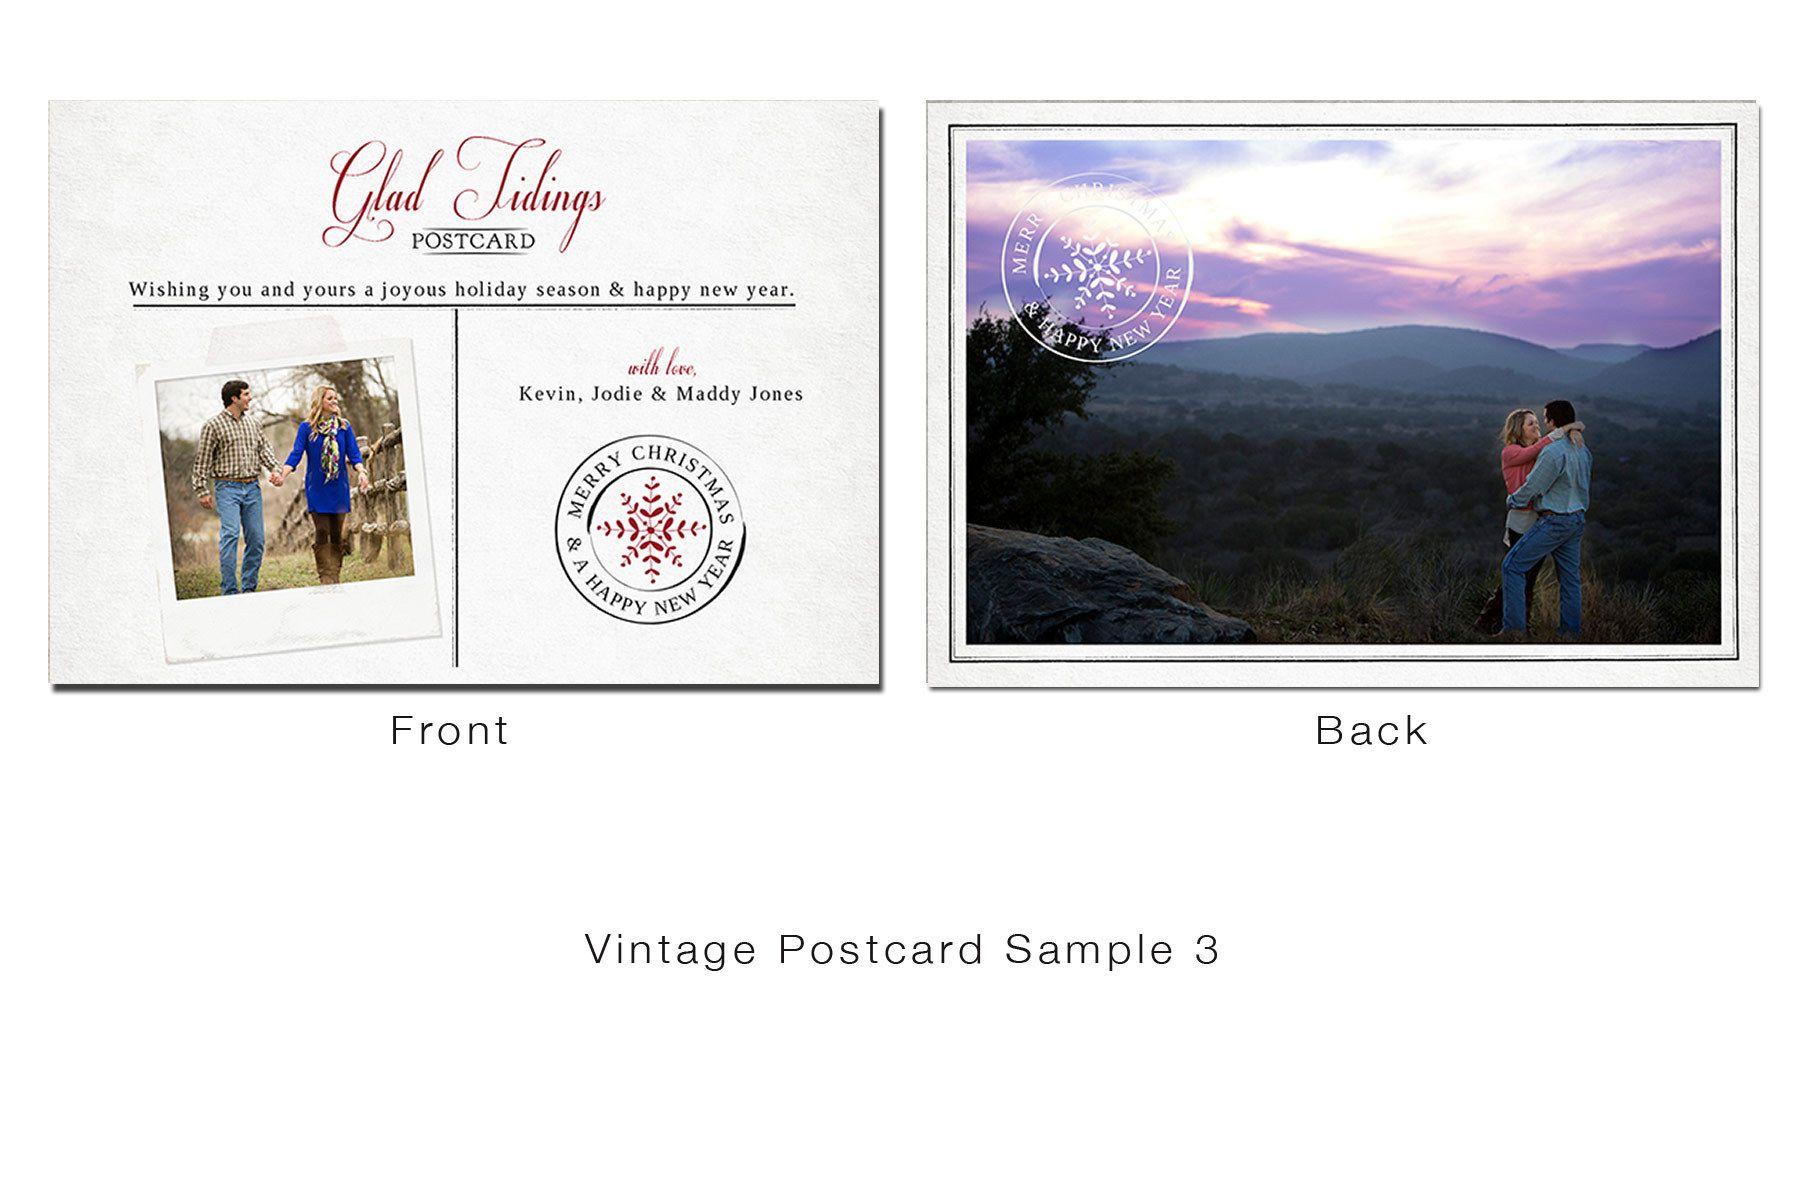 1vintage_postcard_sample_3.jpg